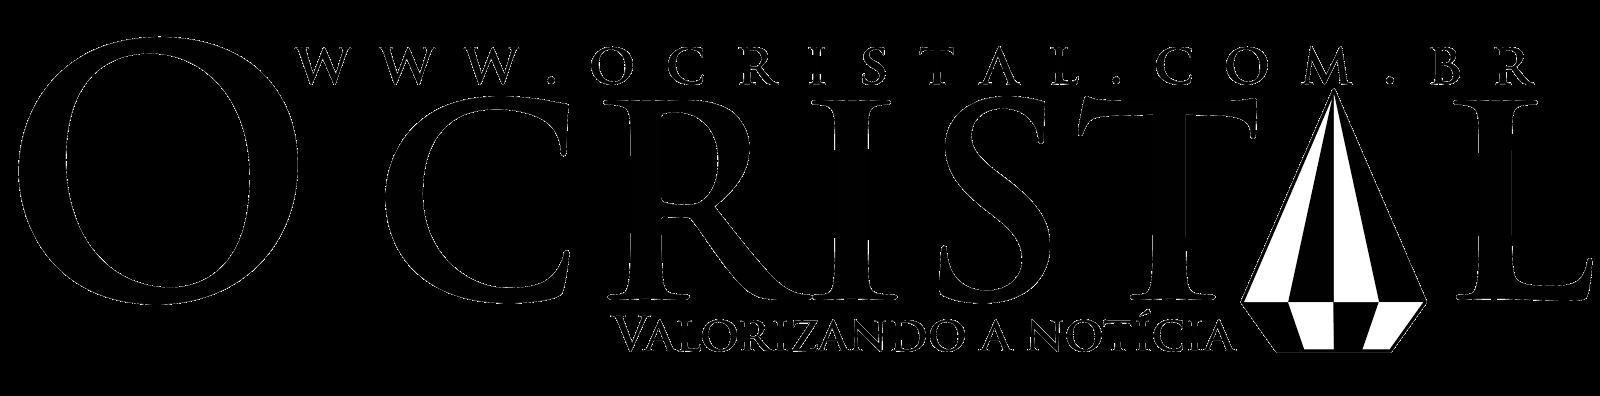 O Cristal  |  Valorizando a Notícia